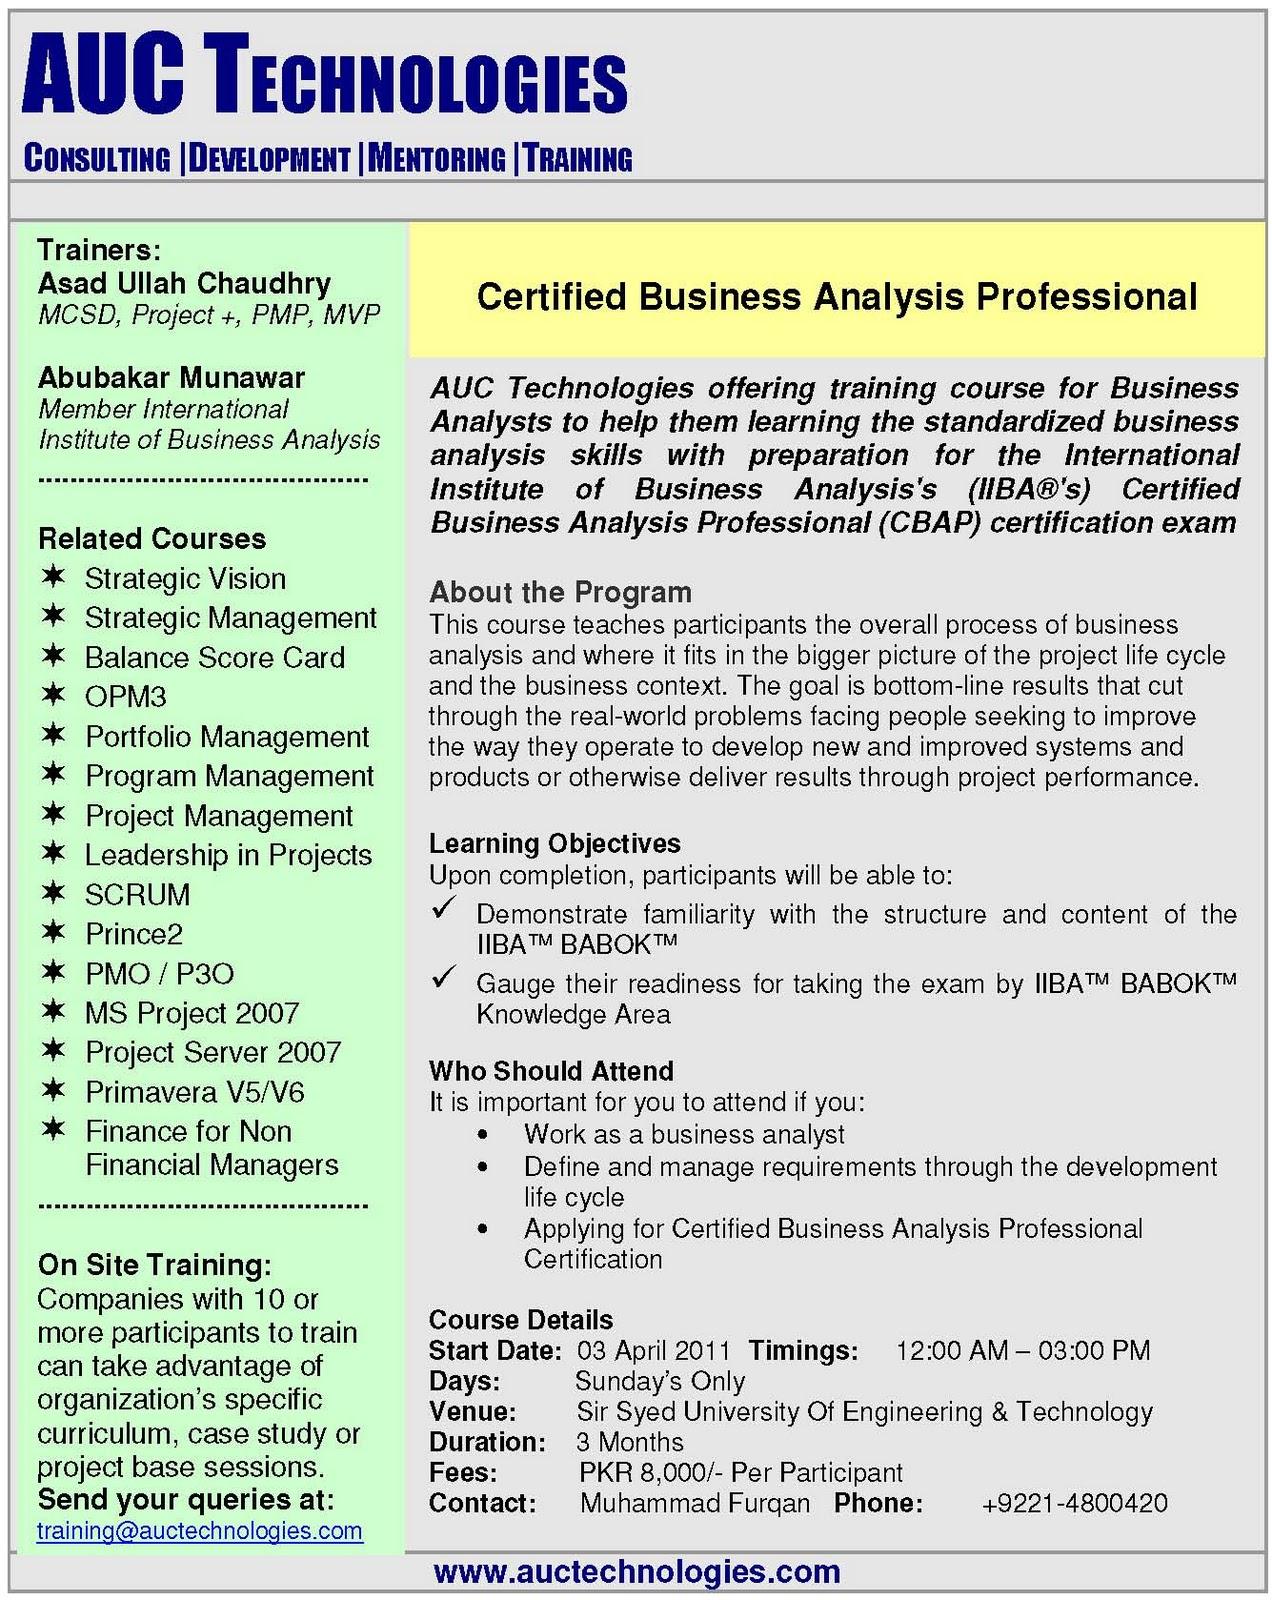 Cbap iiba and ccba study guide ebook http www multisoftsystems com course iiba certified array abubakar munawar cbap cm rh abubakarmunawar blogspot com fandeluxe Gallery